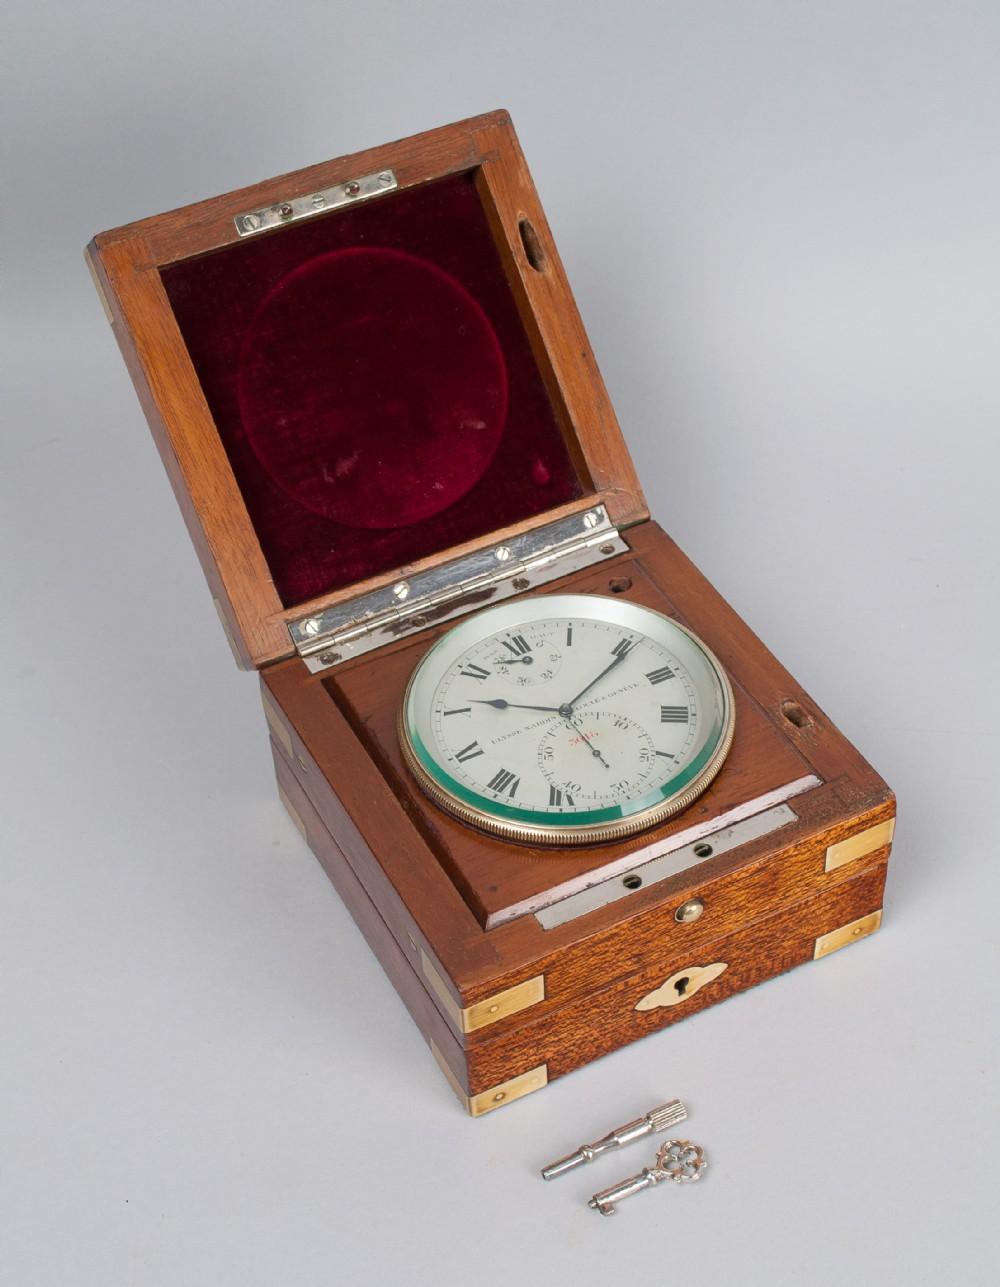 a mahogany cased deck watch chronometer by ulysse nardin c1937